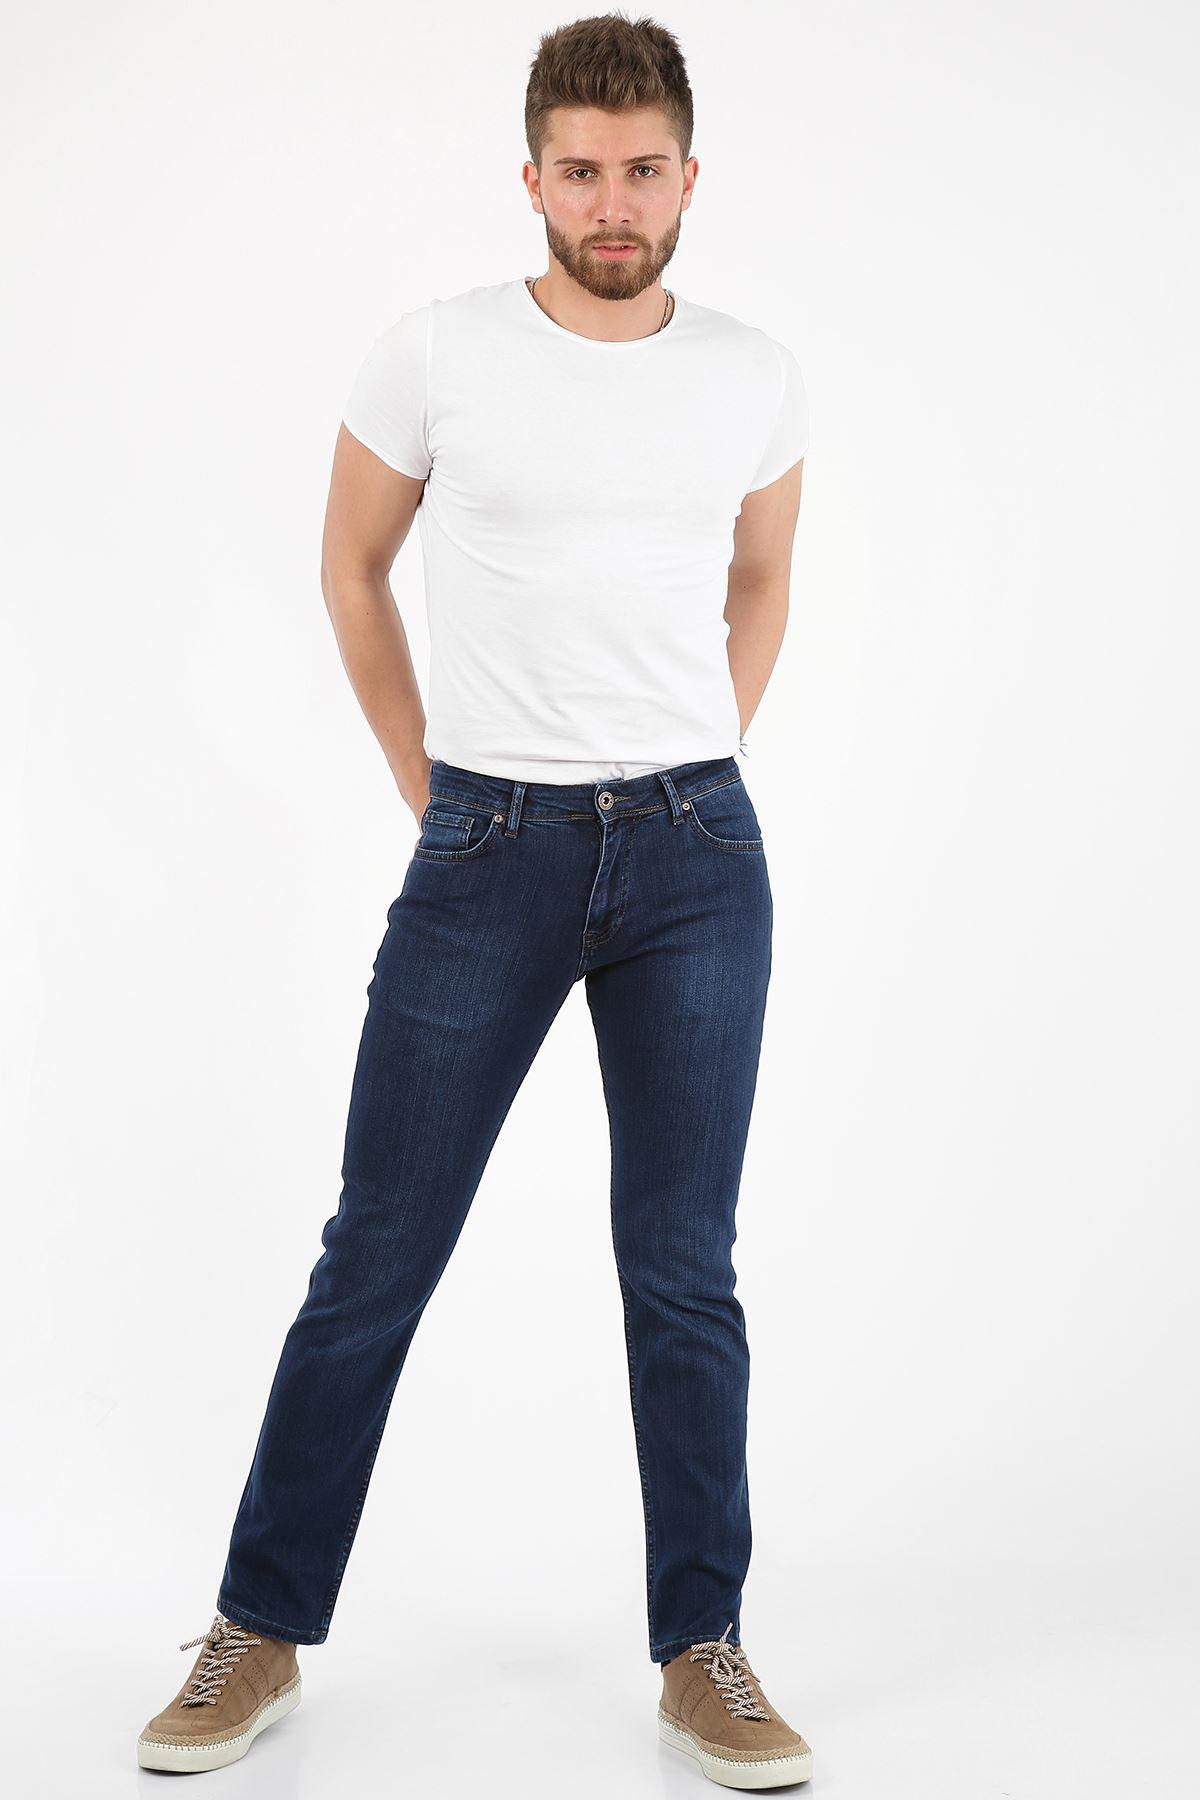 Mavi Regular Fit Fermuarlı Erkek Jeans Pantolon-FARADAY